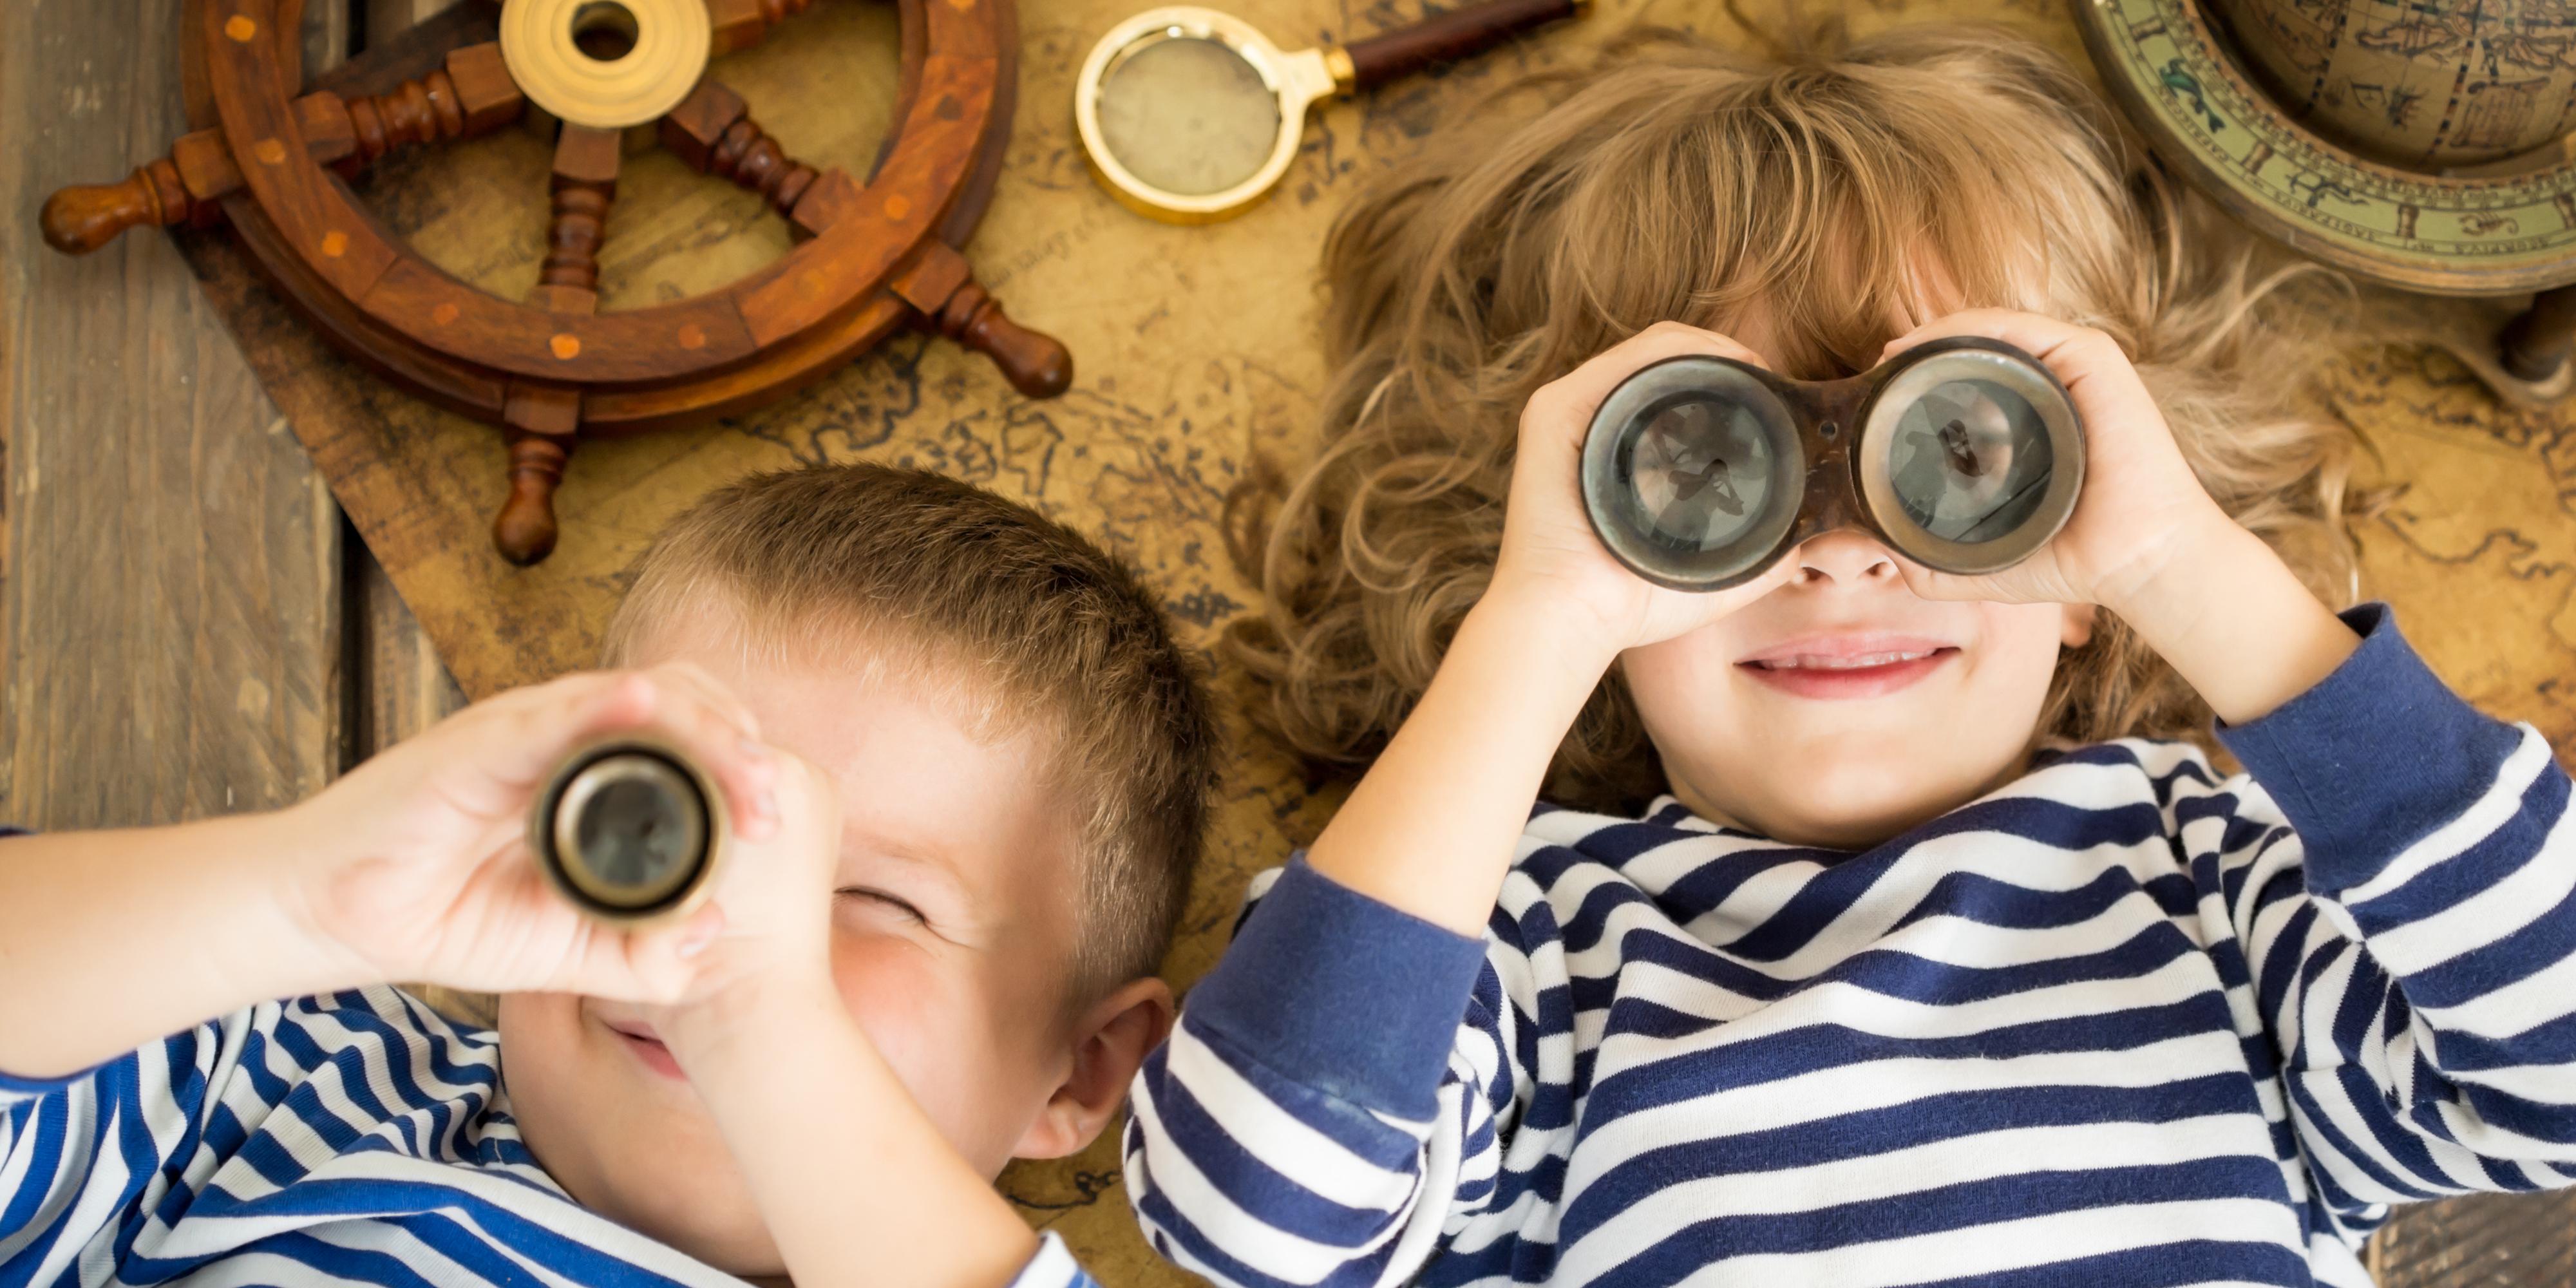 two kids wearing stripes looking out binoculars